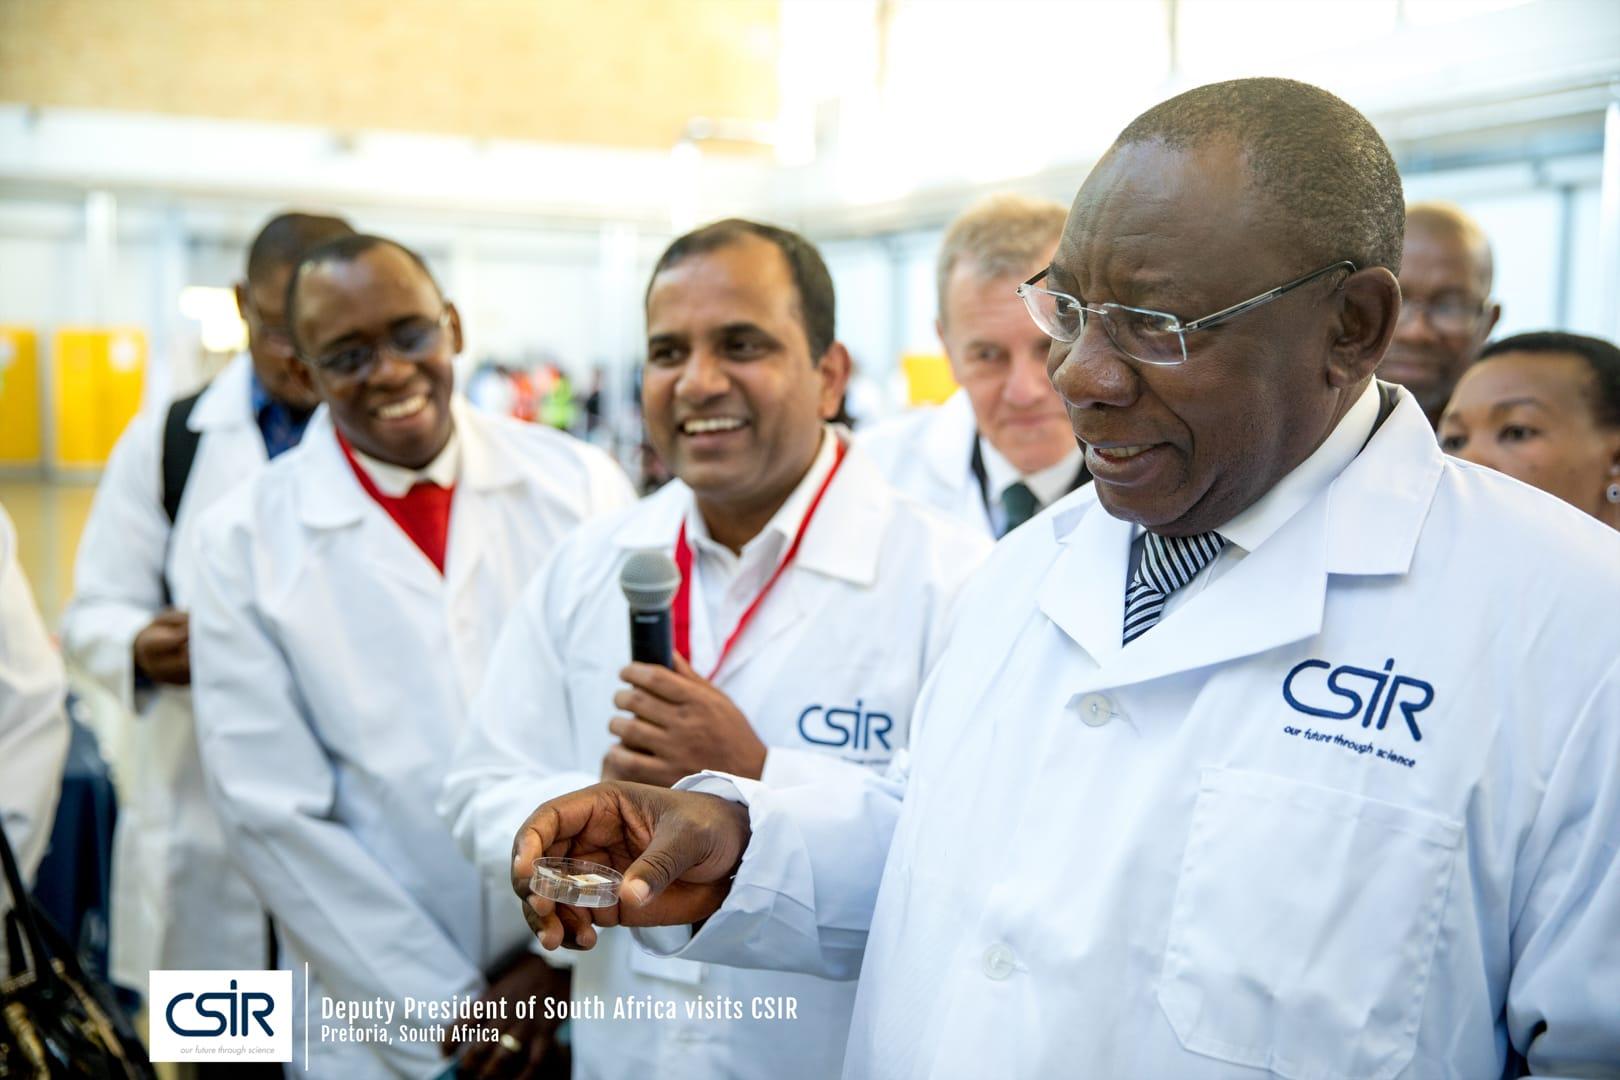 Deputy President of South Africa Visits CSIR